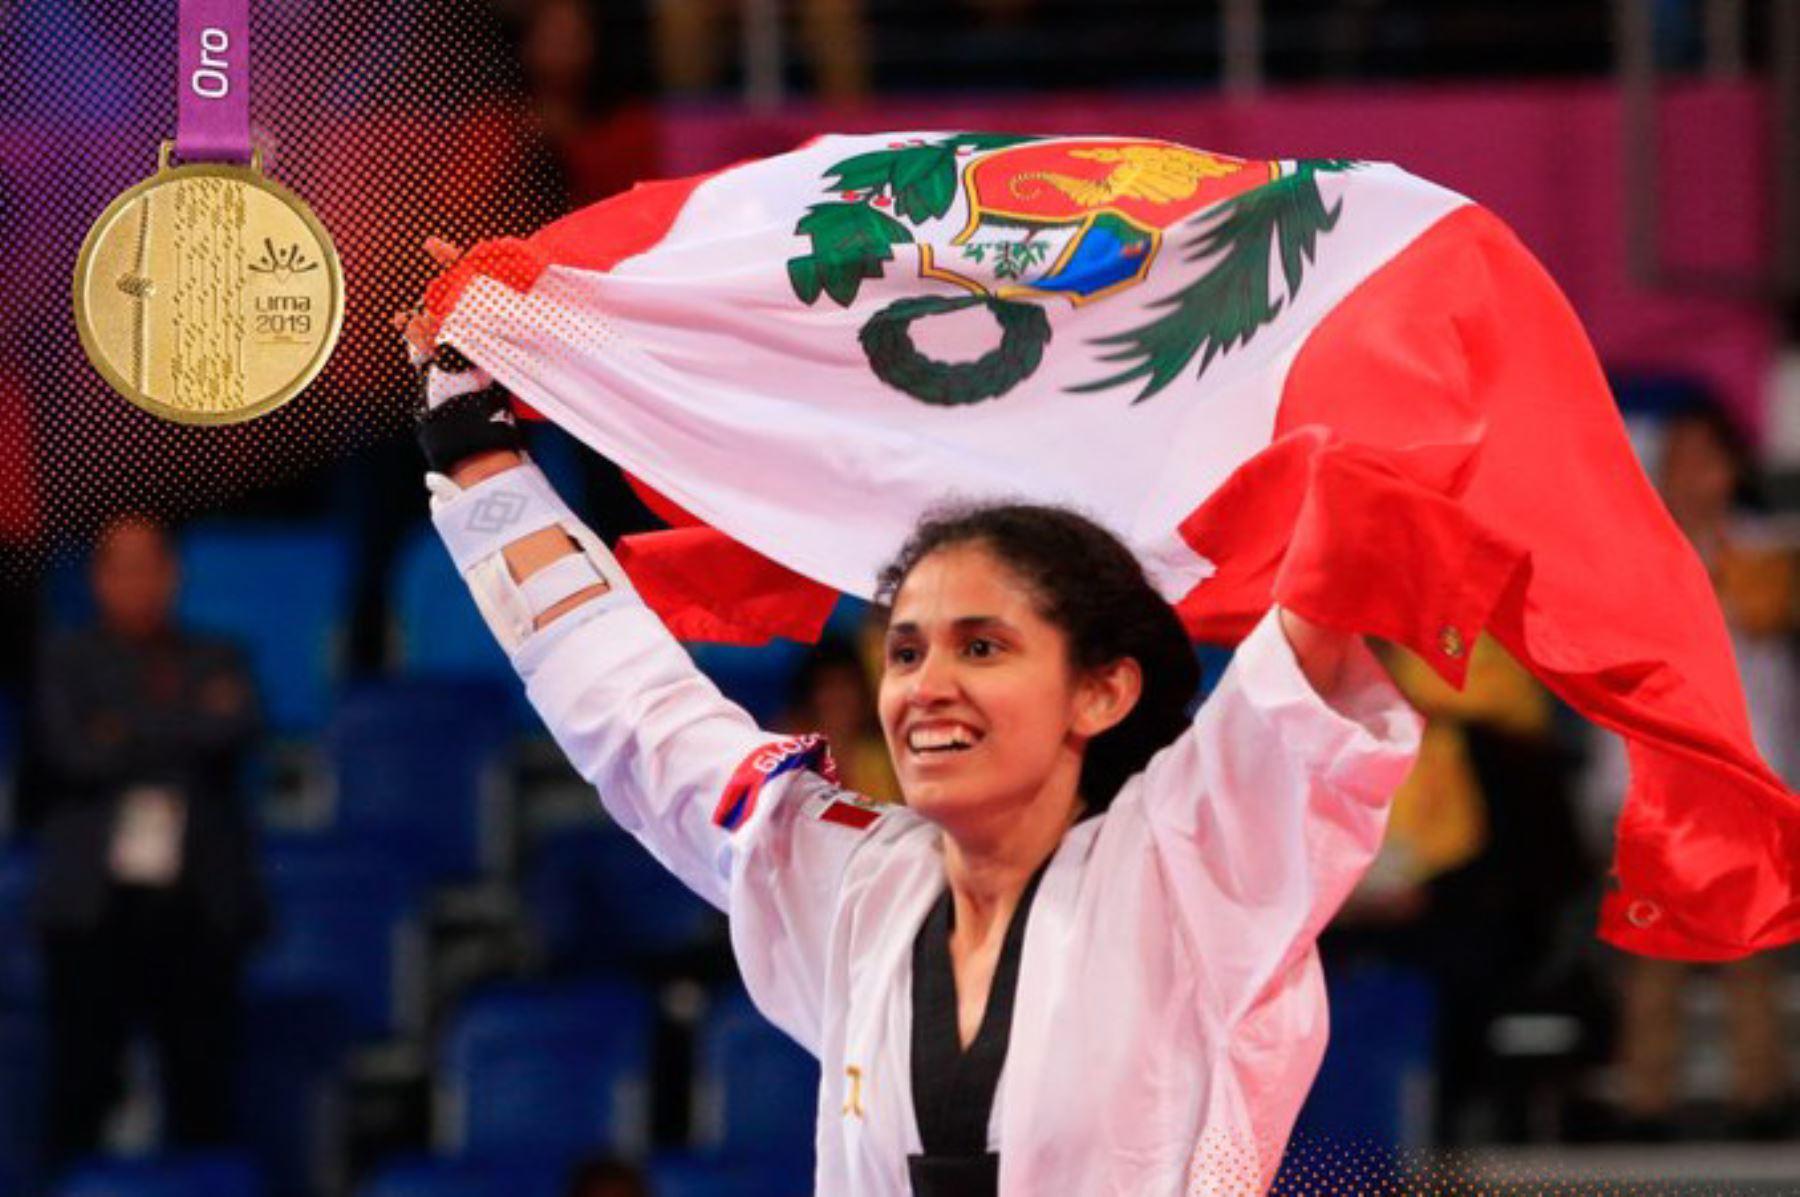 Lima 2019: Angélica Espinoza gana tercera medalla de oro para el Perú en parataekwondo